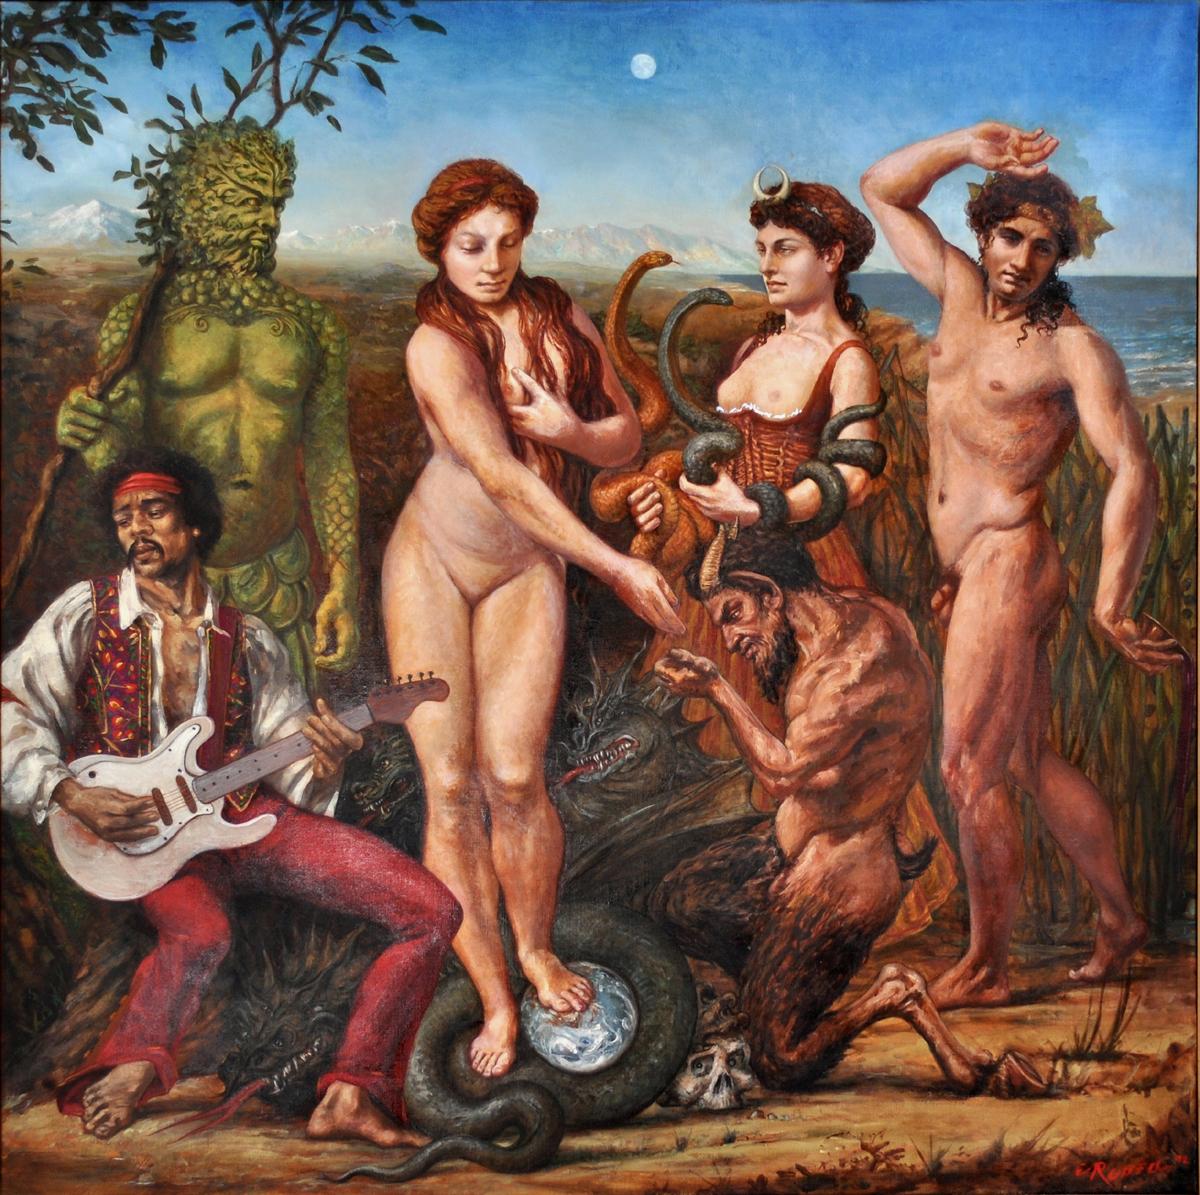 Pagan erotic rituals